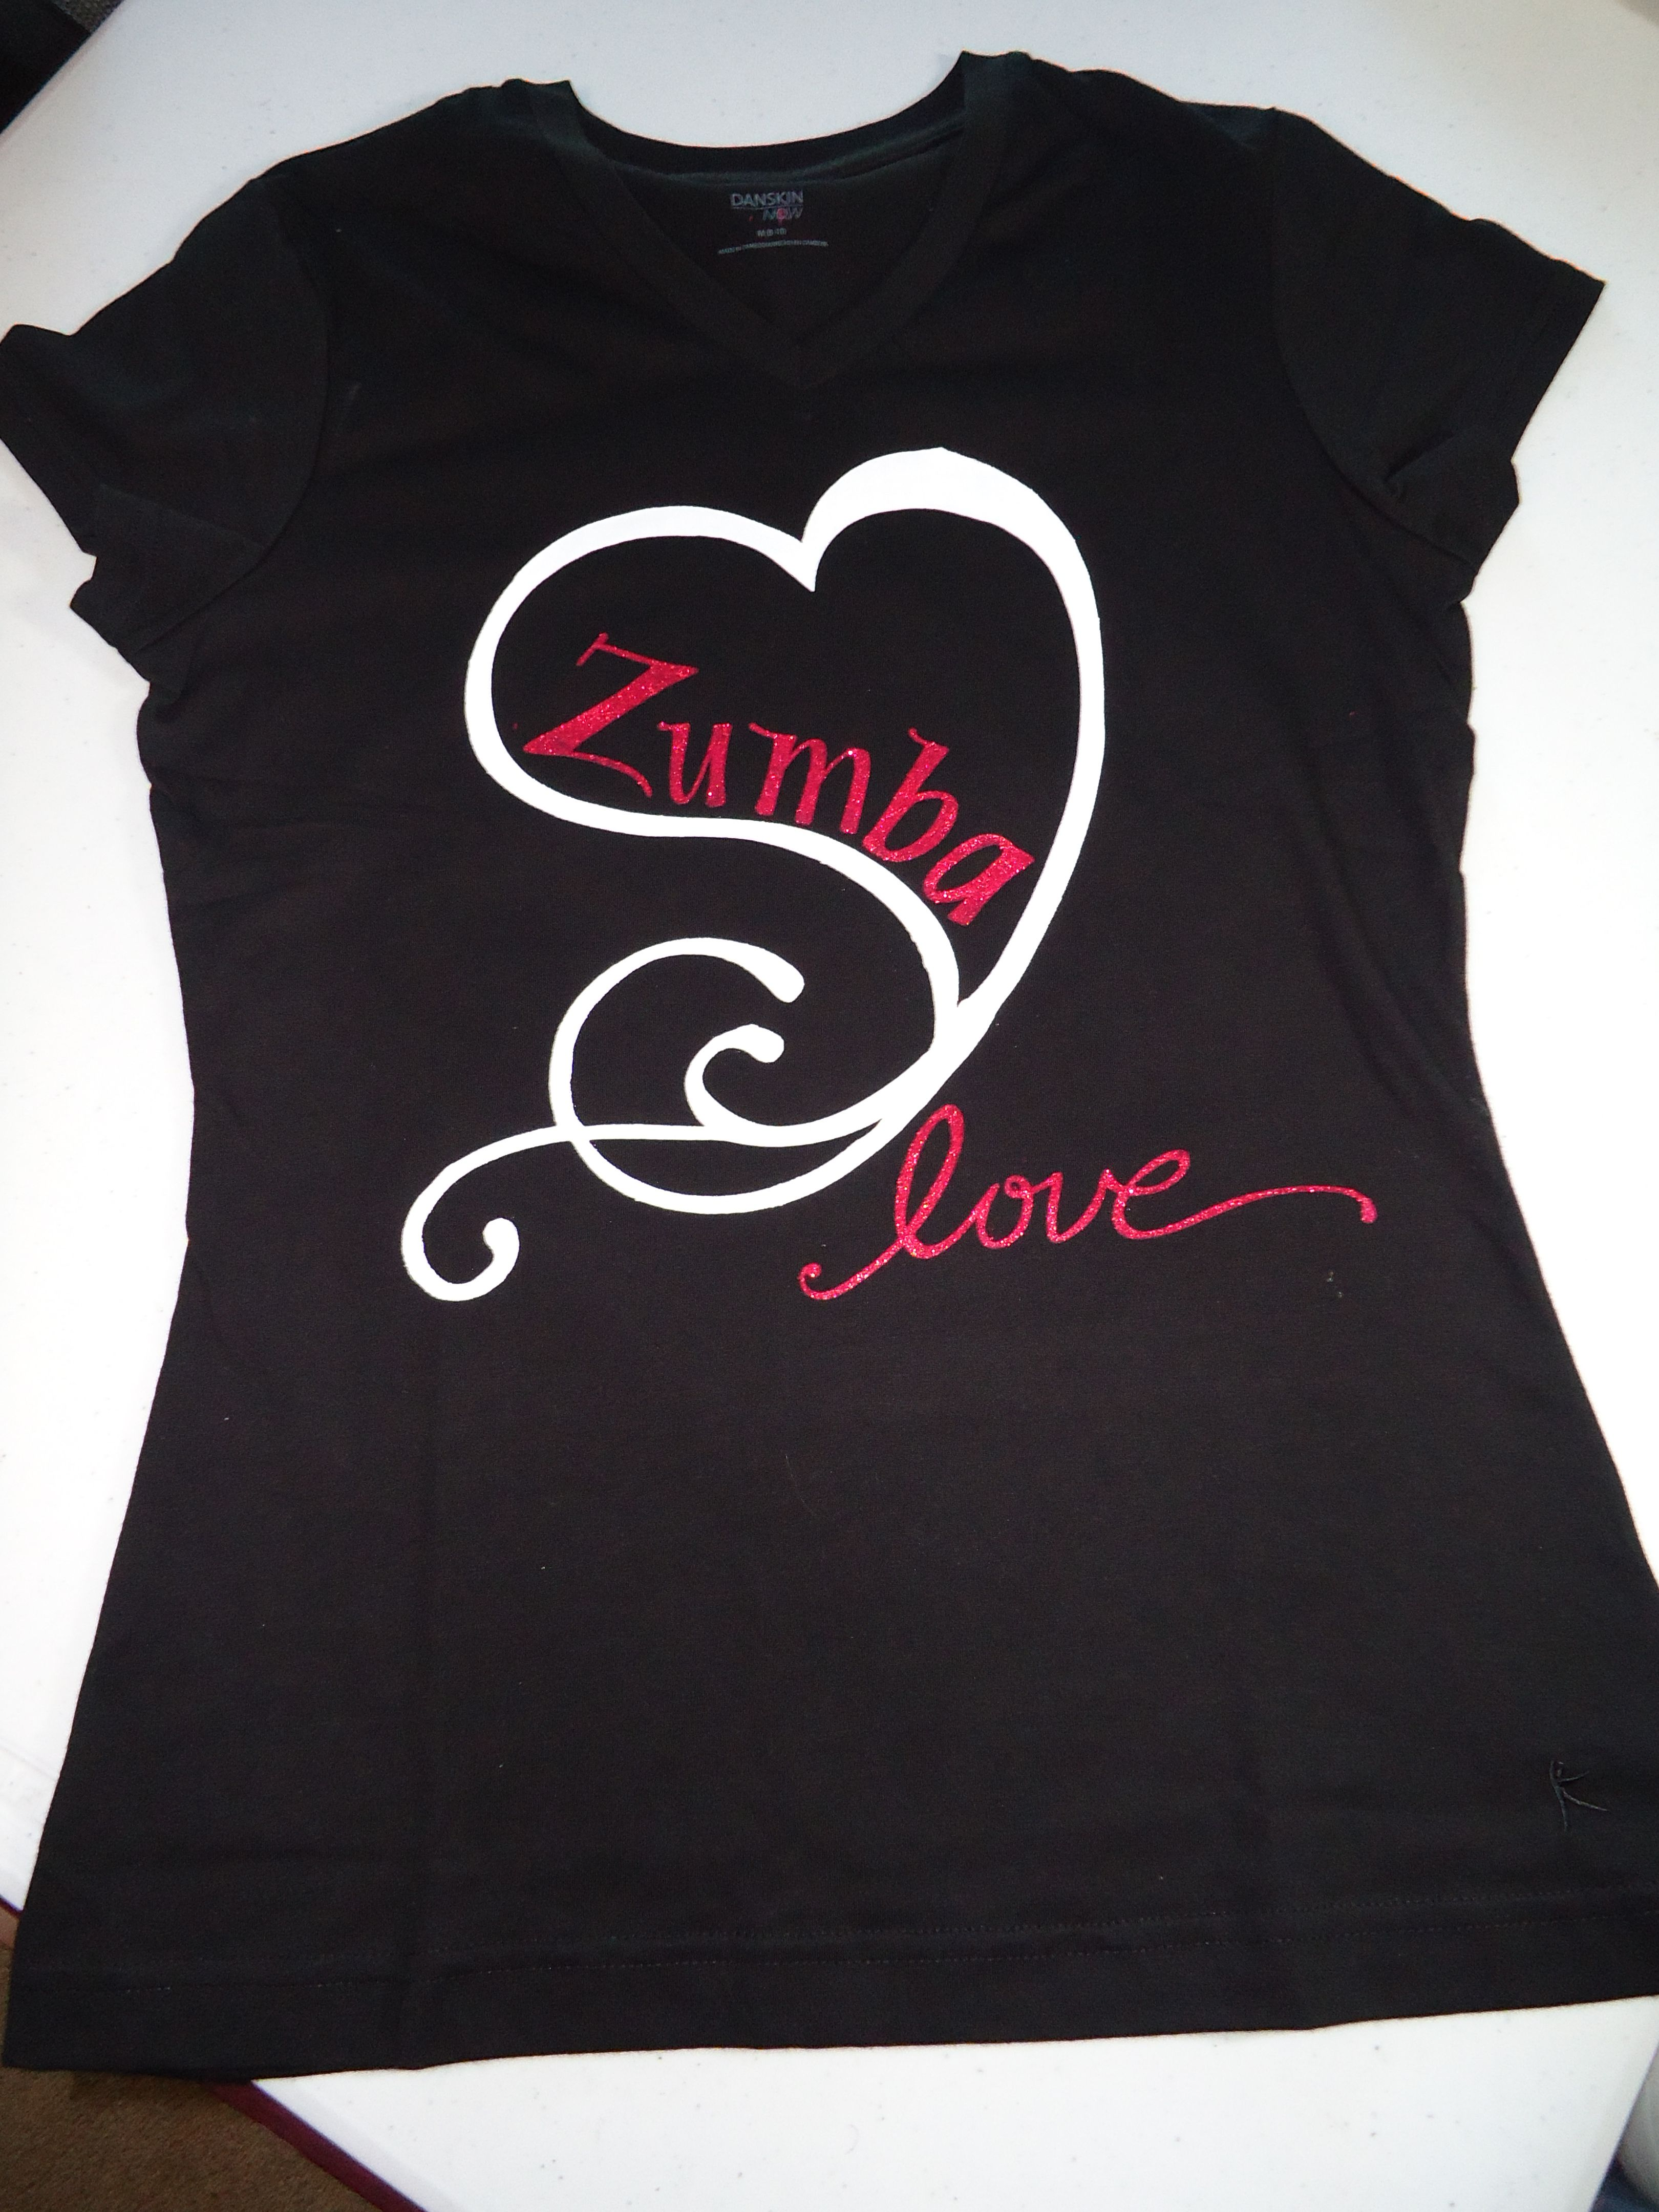 T-shirt design for zumba - Zumba Shirt Front